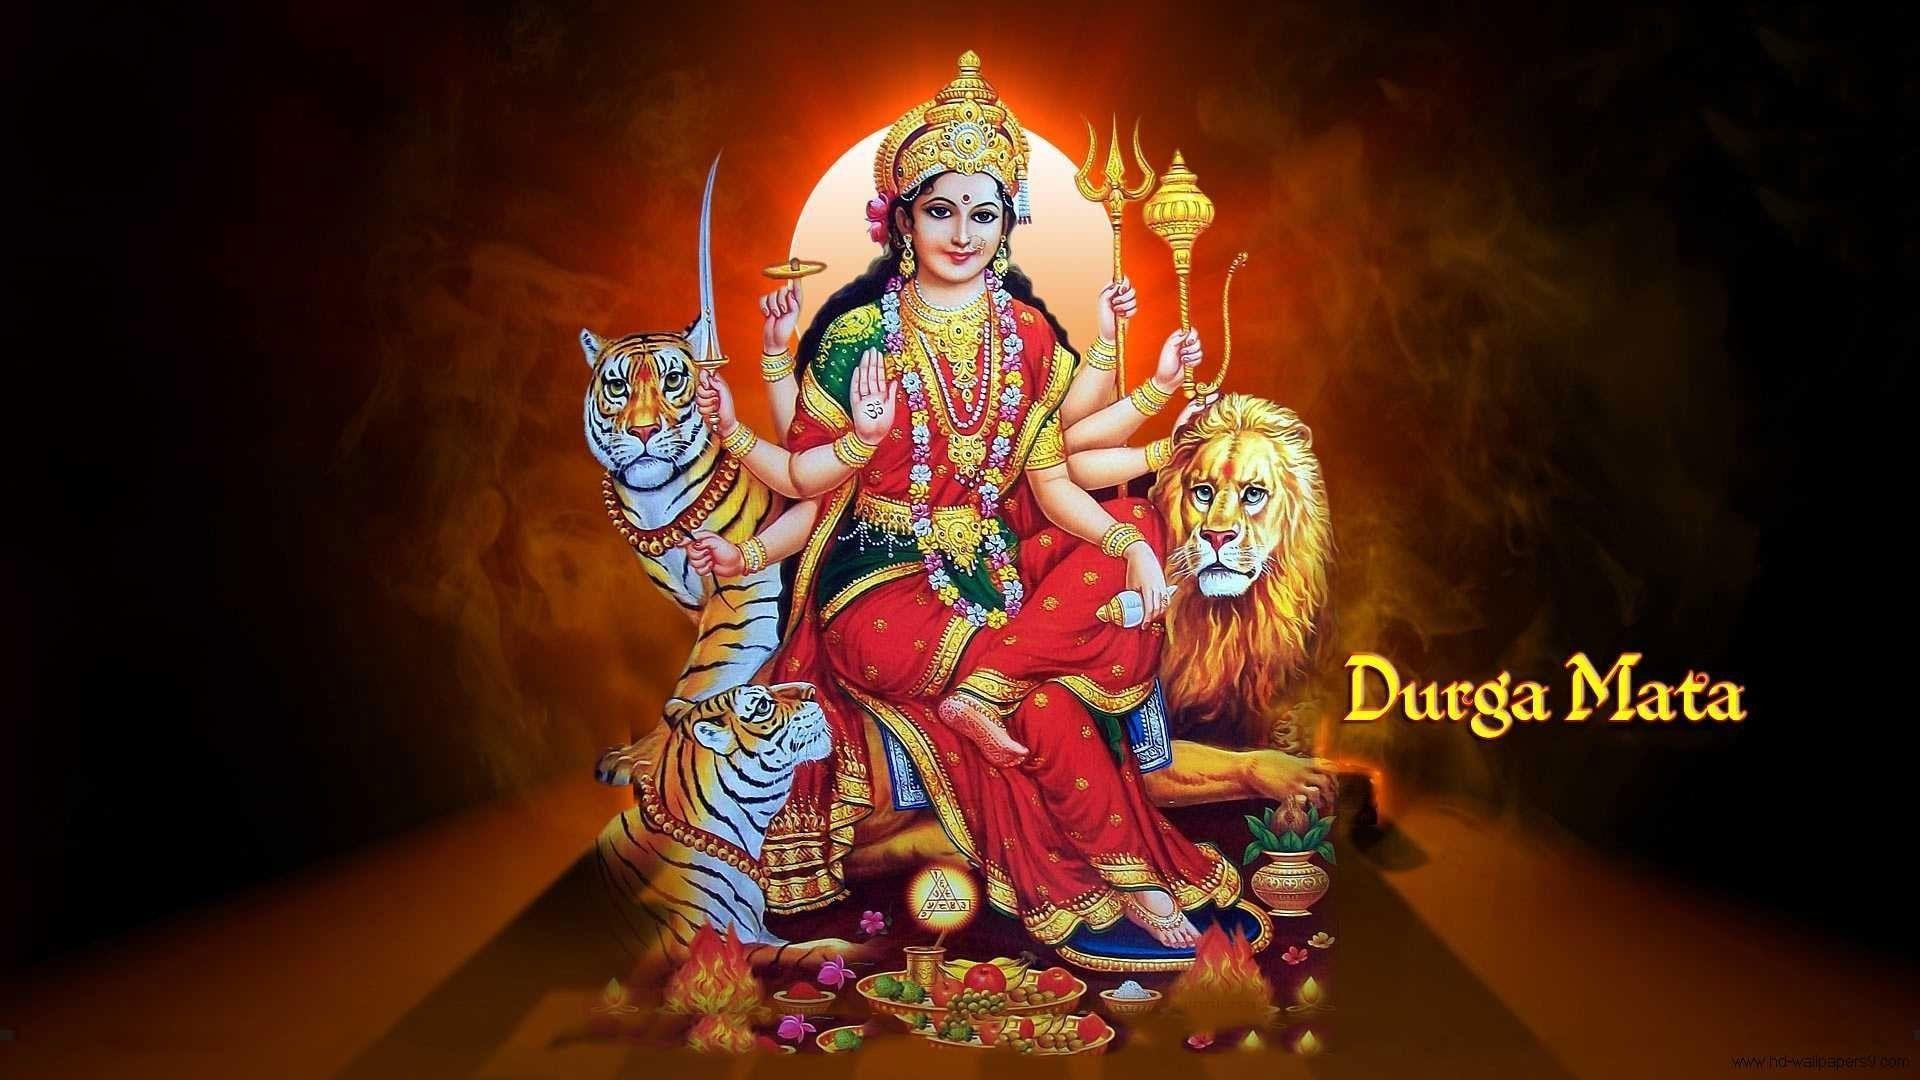 Awesome High Resolution Desktop Wallpaper Hd 3d Full Screen God Lord Murugan Pic 3dwall 3dwall Awesome Deskto Maa Durga Hd Wallpaper Durga Durga Maa